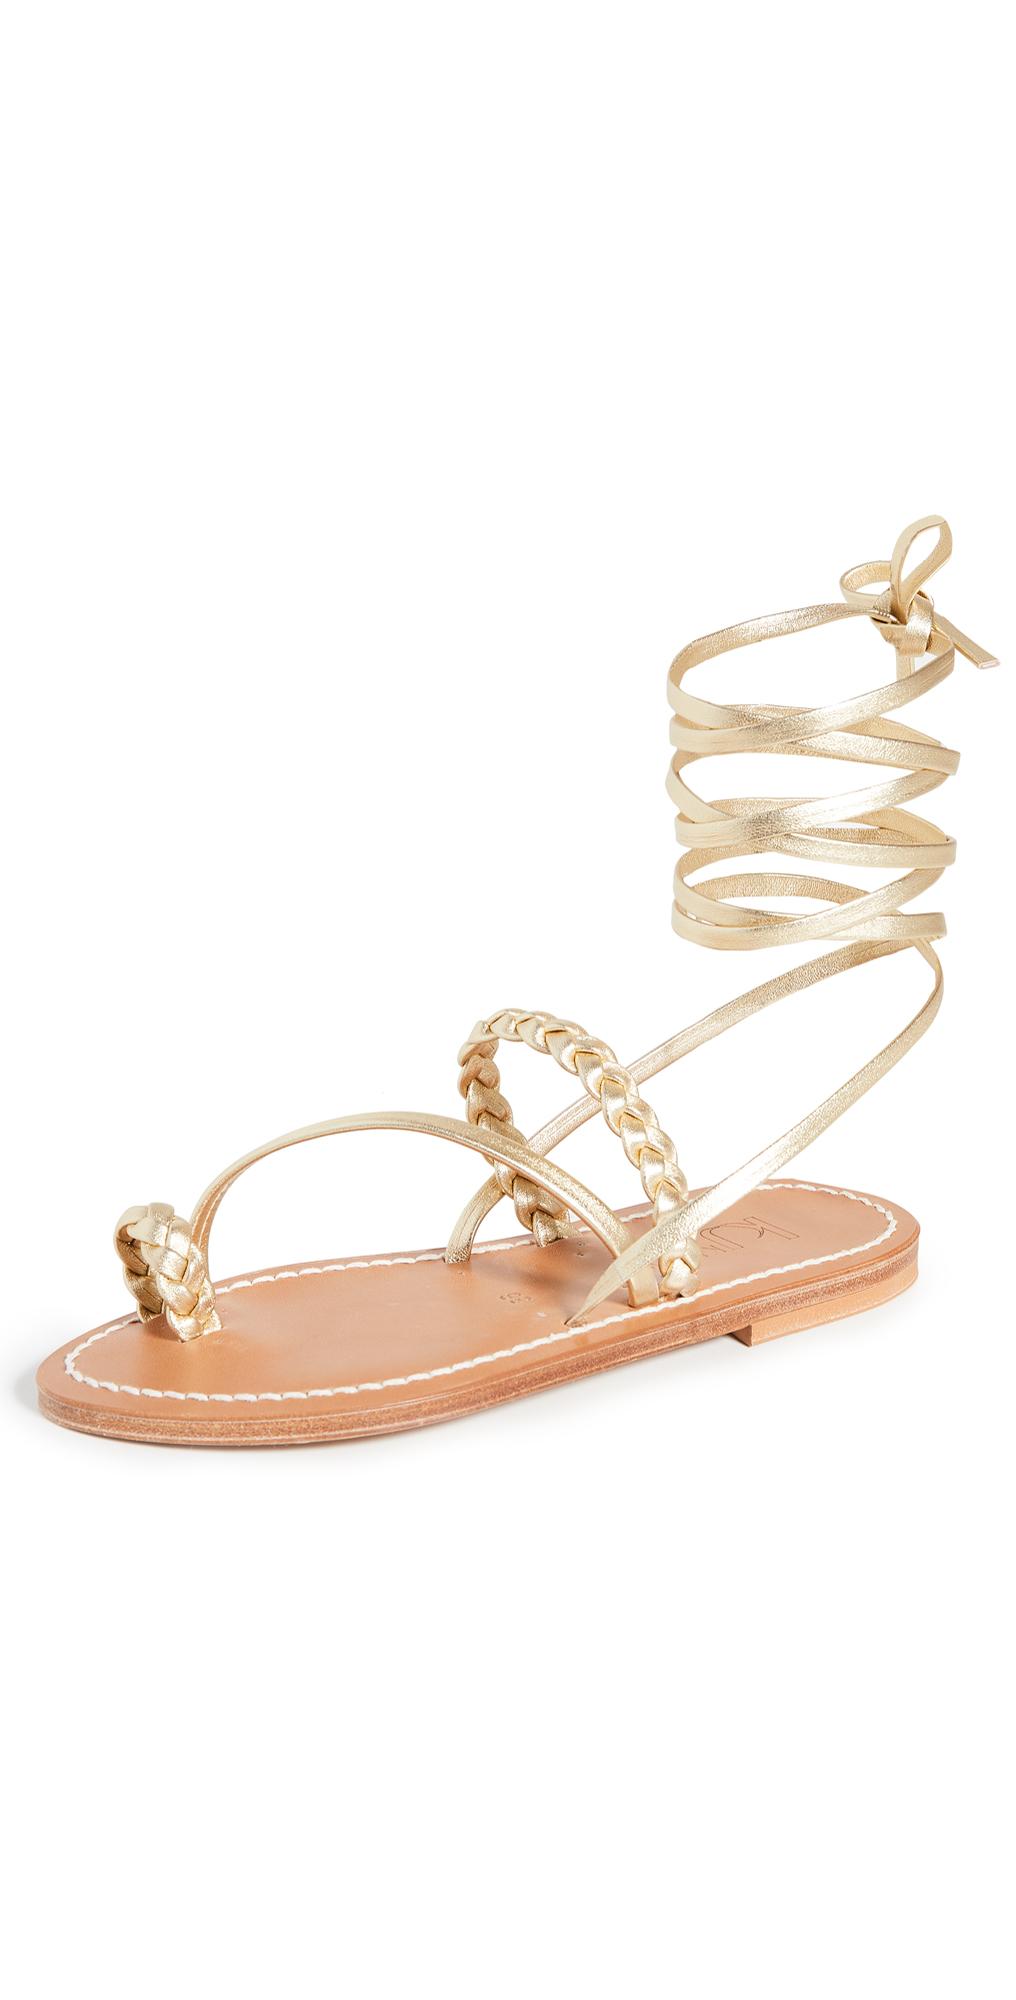 Scara Wrap Sandals